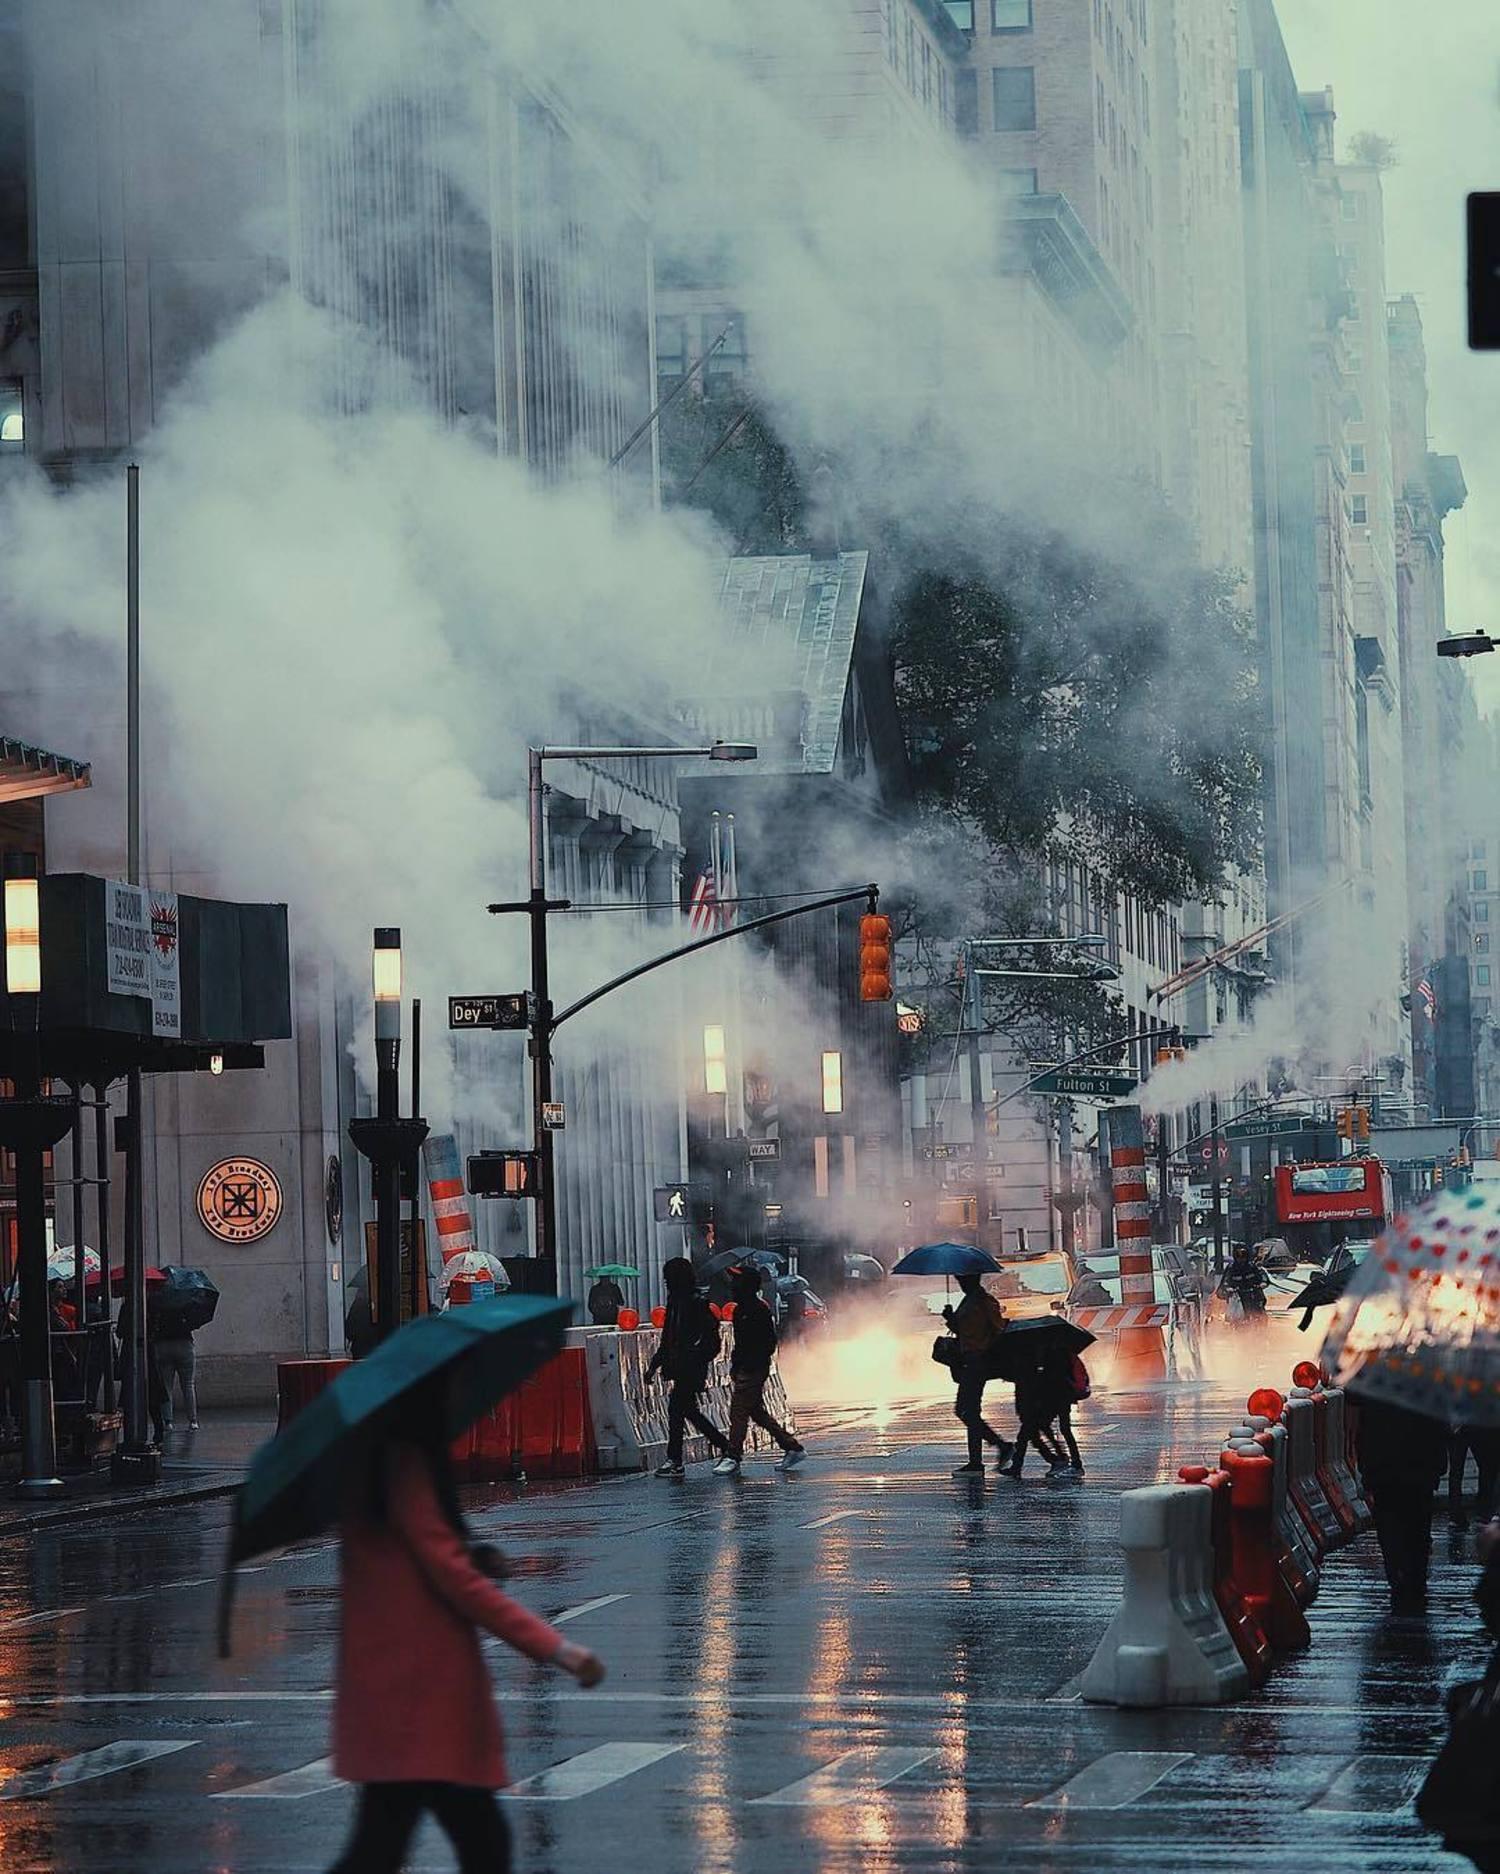 Broadway and Dey St., Financial District, Manhattan